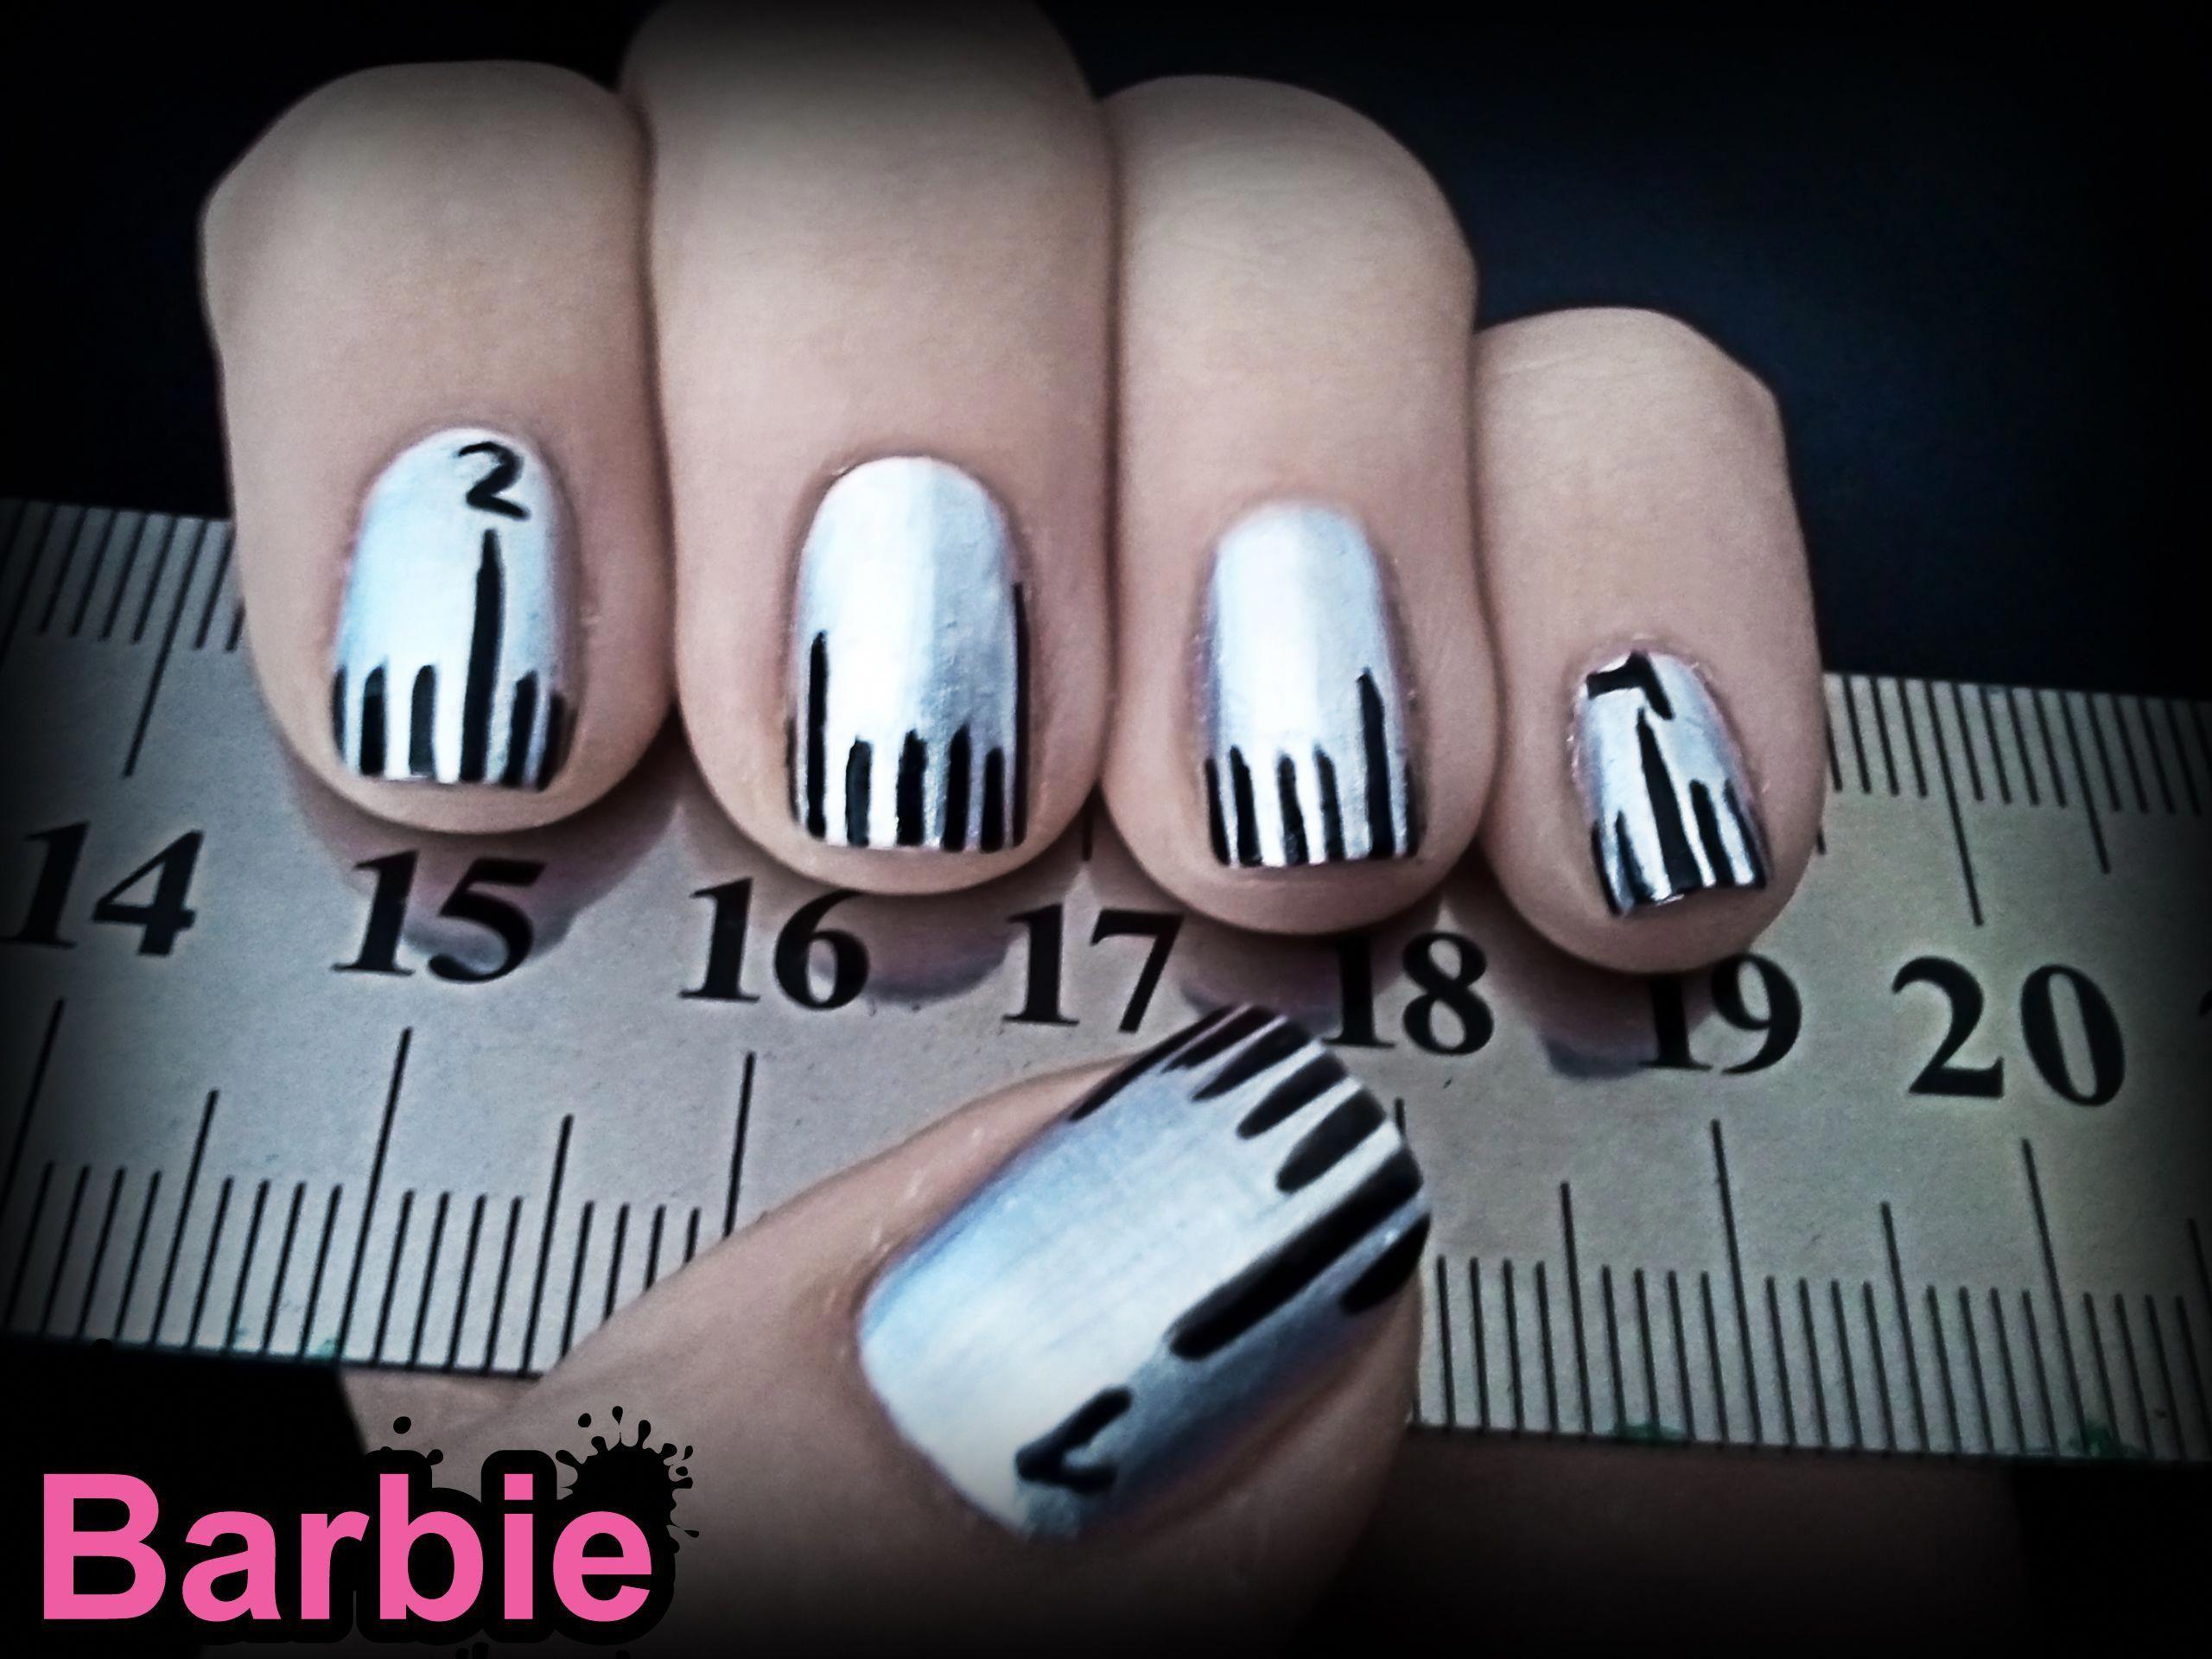 Ruler Nails Nail Design That Simulates A Metal Ruler Maybe It Turns Out Real Handy Geeknailsdesign Nail Designs Nails Nail Art Tutorial